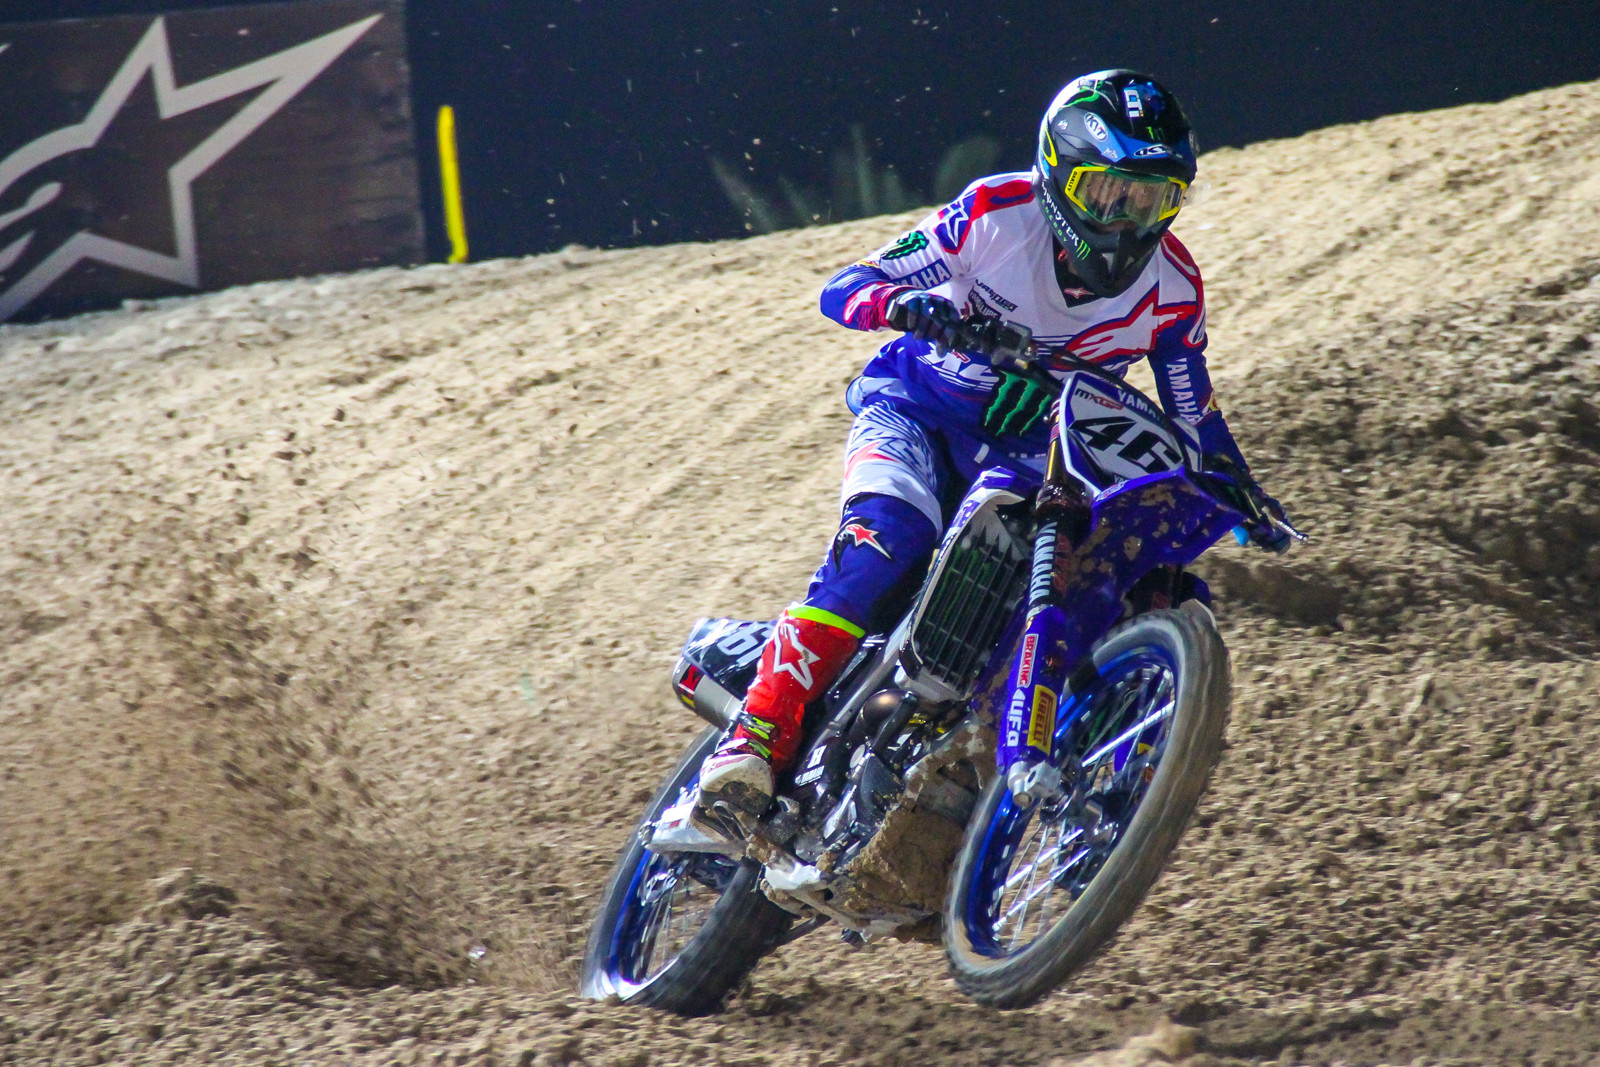 Romain Febvre - Photo Blast: 2017 MXGP of Qatar - Motocross Pictures - Vital MX